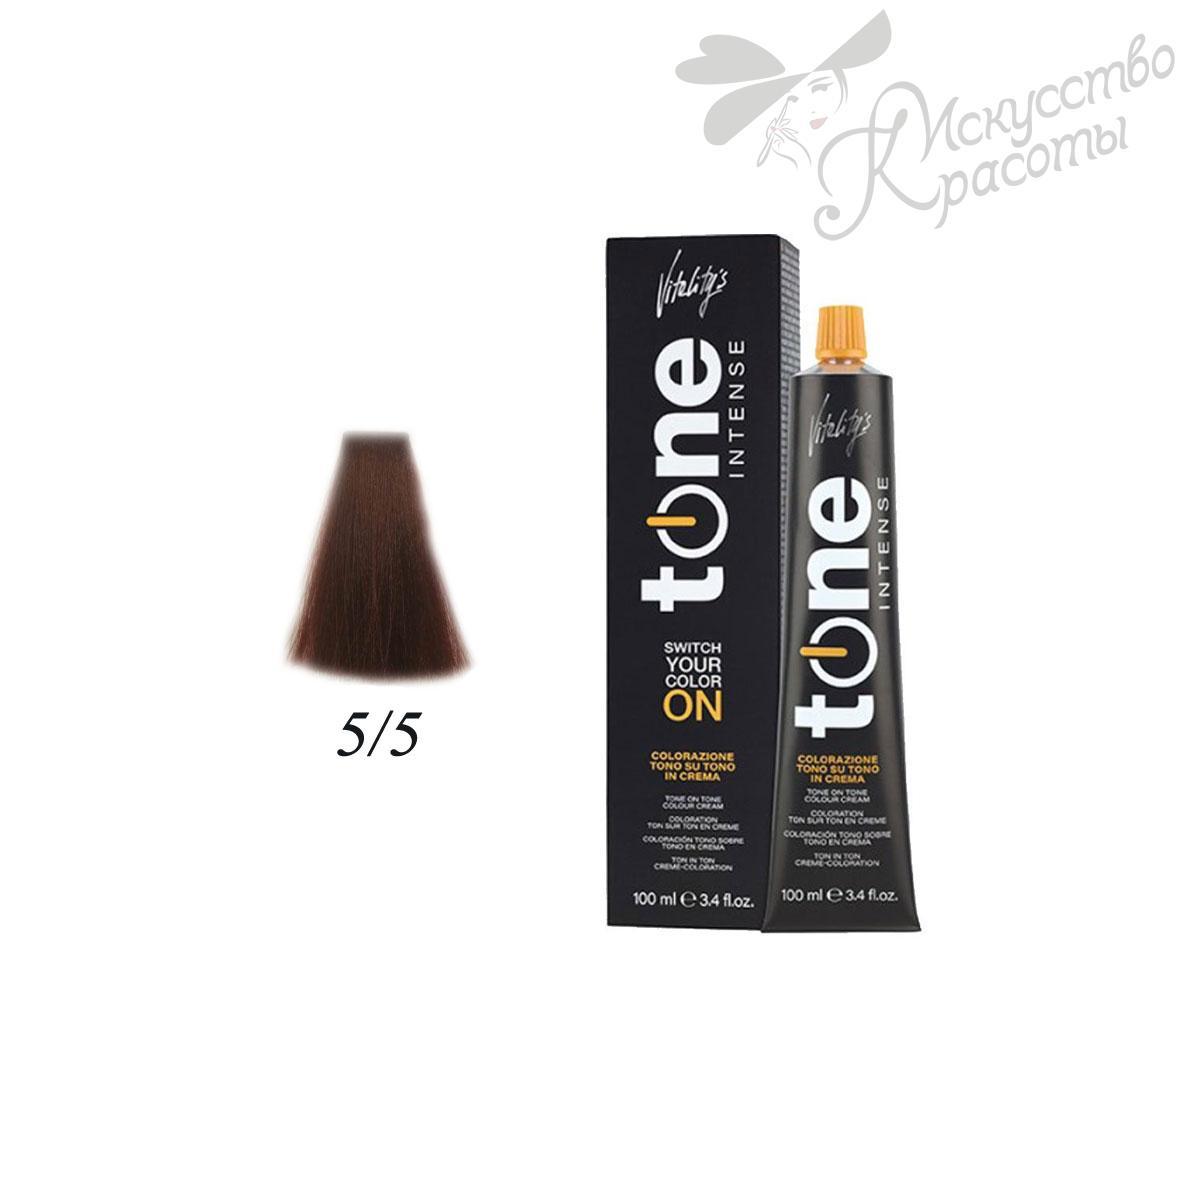 Краска для волос 5/5 светло-каштановый махагон Tone Intense Vitality's 100мл